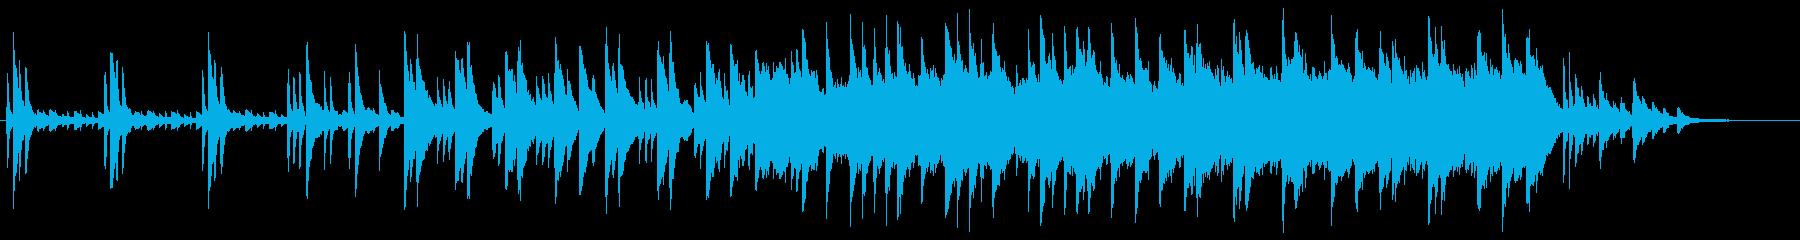 CM 3.夜 静か 星空 ヒーリングの再生済みの波形